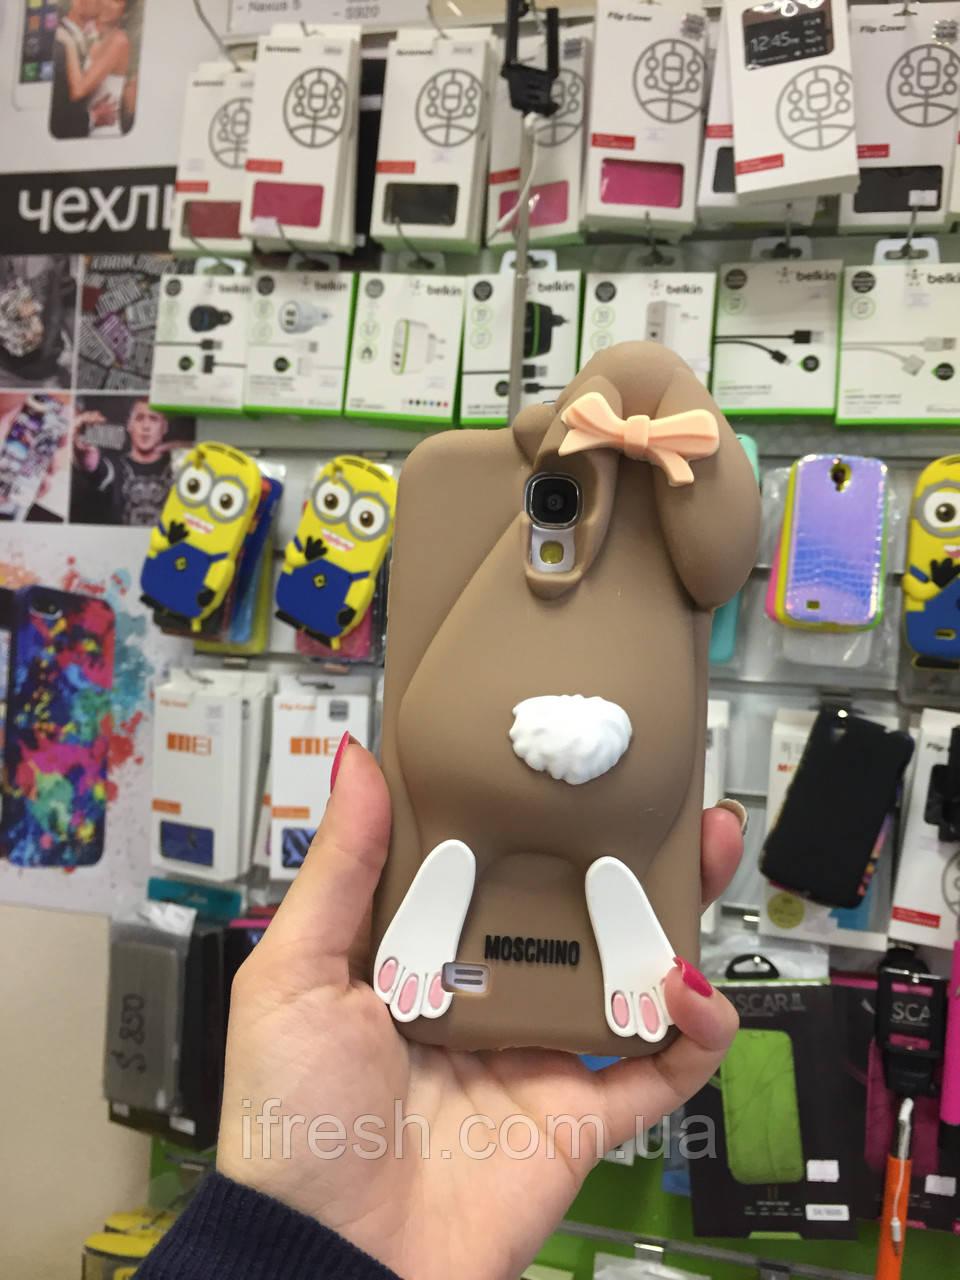 Чехол заяц Moschino для Samsung S4 i9500, шоколадный